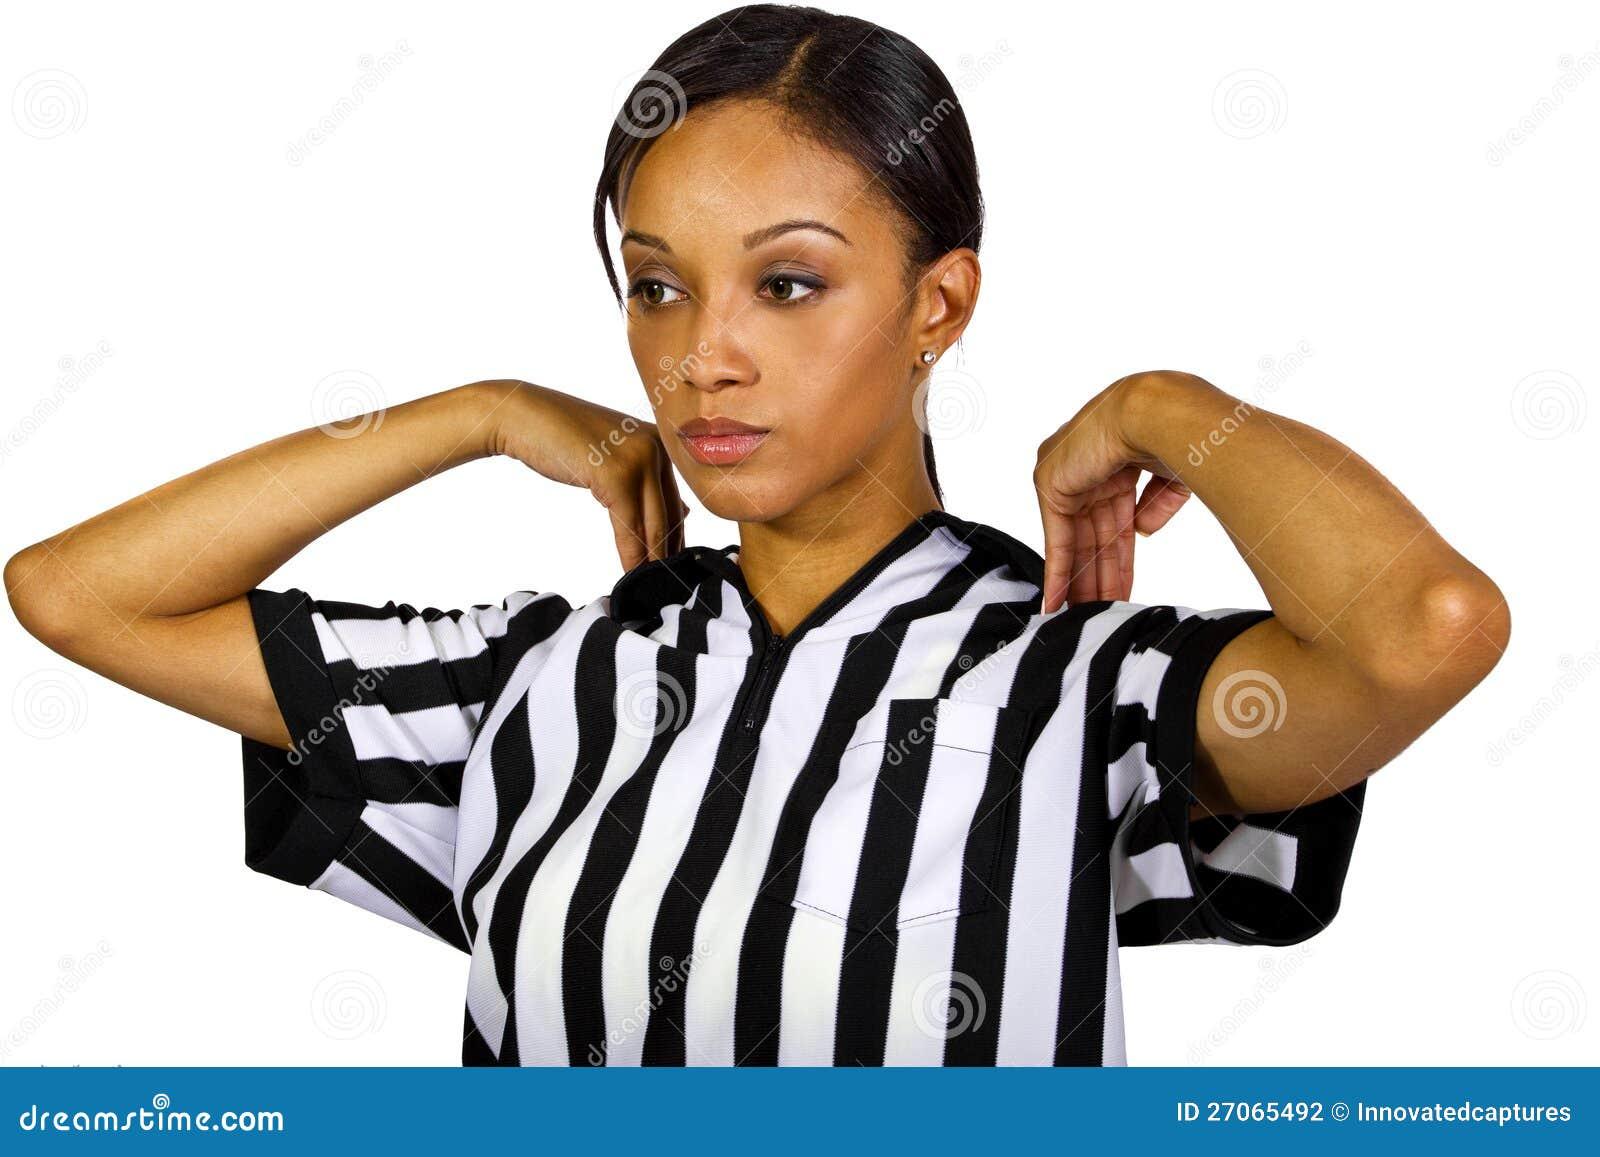 Female Referee Stock Photo. Image Of Foul Person Beautiful - 27065492